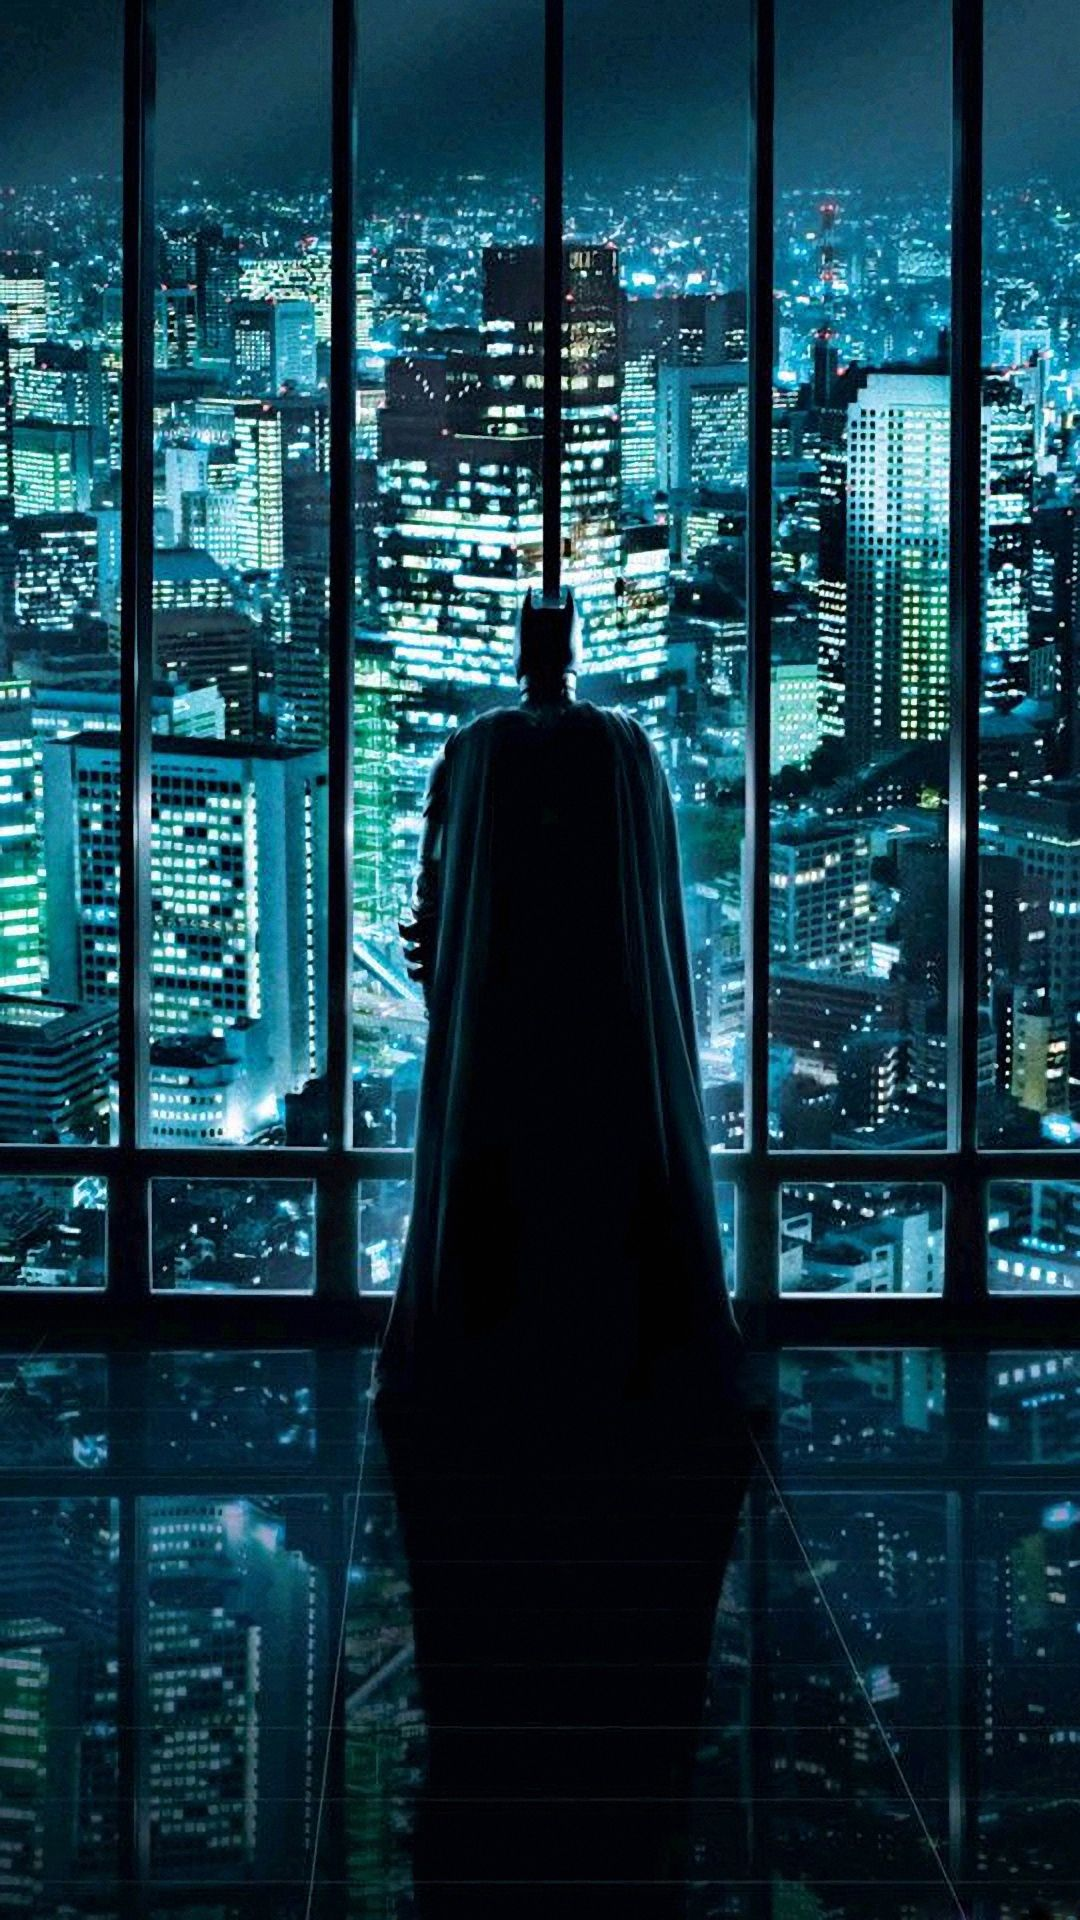 Batman Wallpaper 1080p Hupages Download Iphone Wallpapers